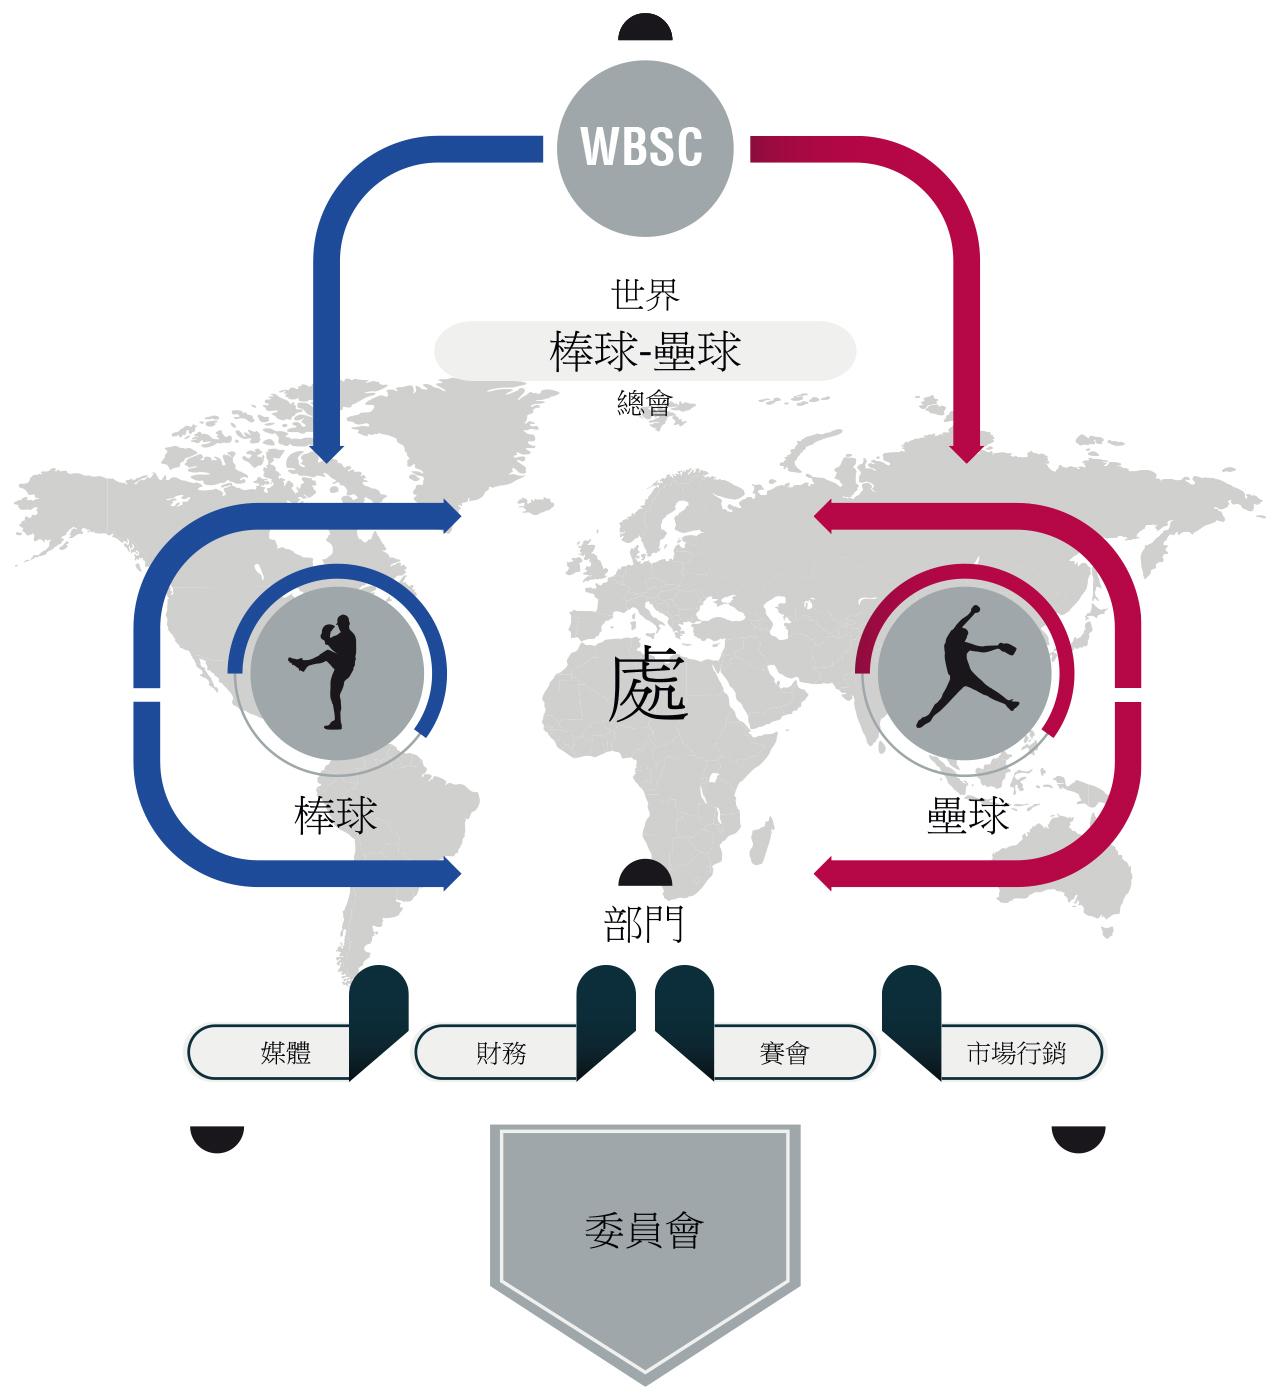 WBSC Organizational Ingographic